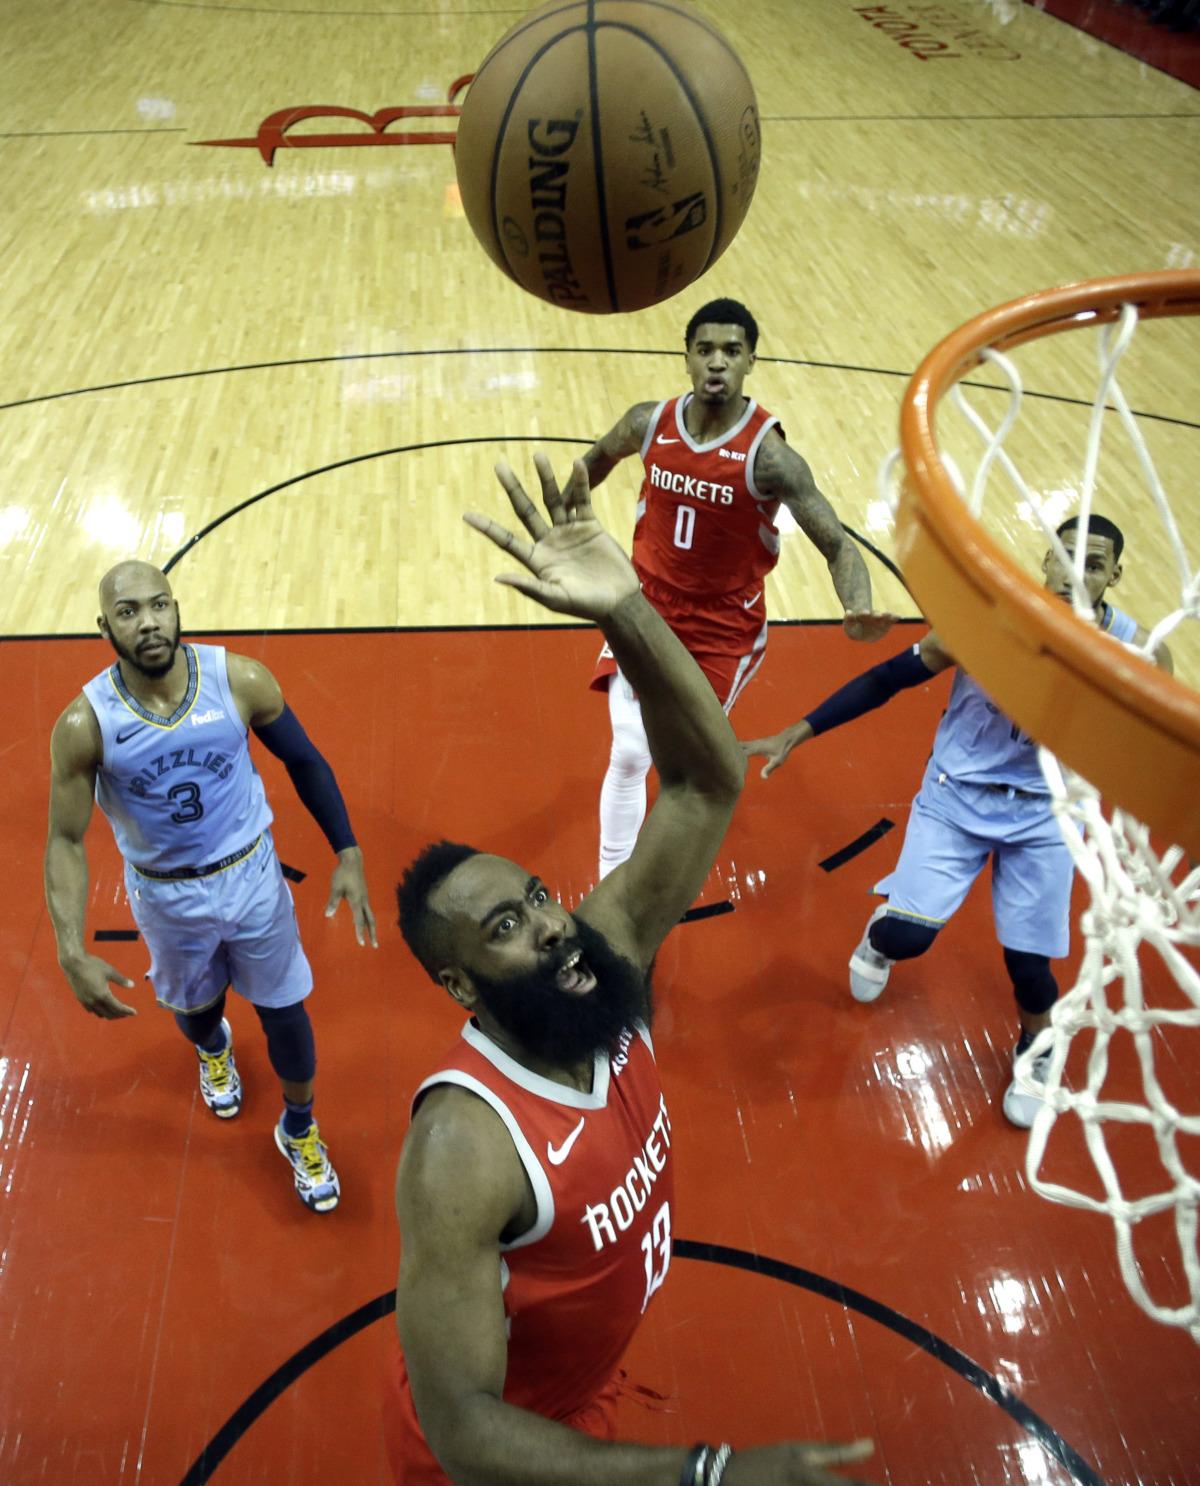 72f6b9d1b90e James Harden lights up Grizzlies for 57 points as Rockets win 112-94 - The  Daily Memphian